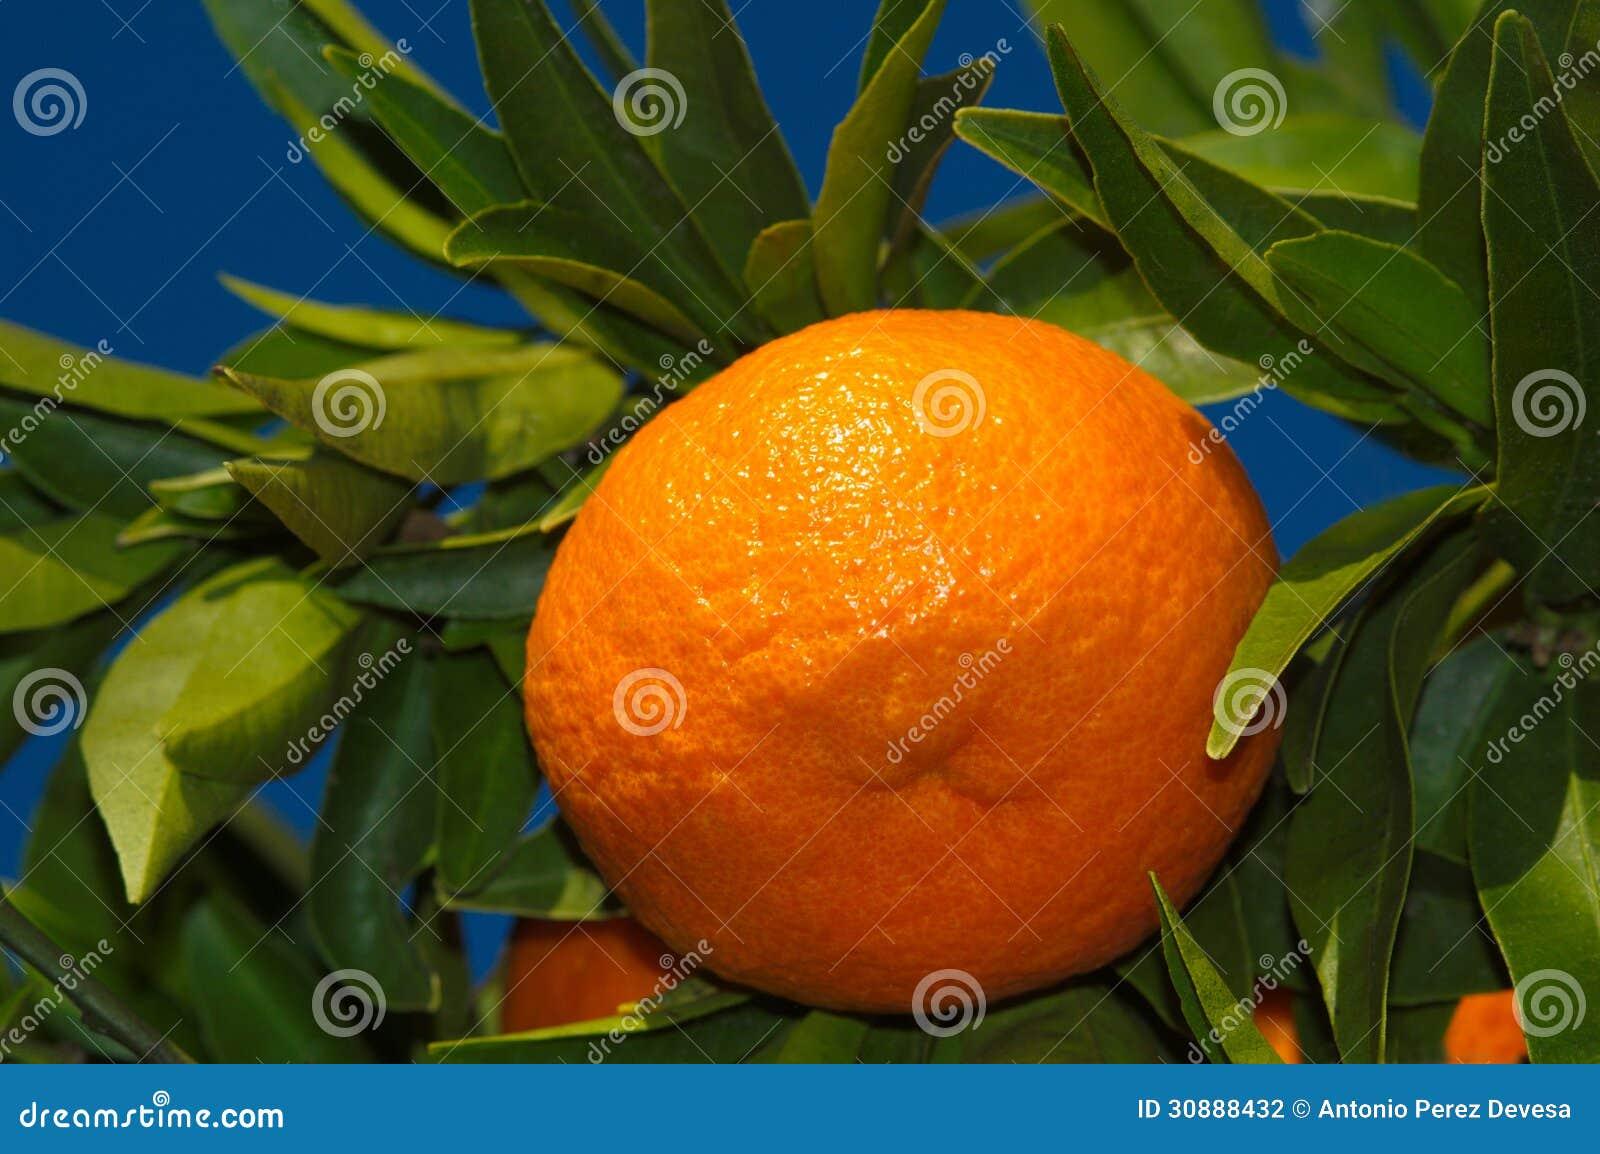 orange jpg deep blue - photo #20